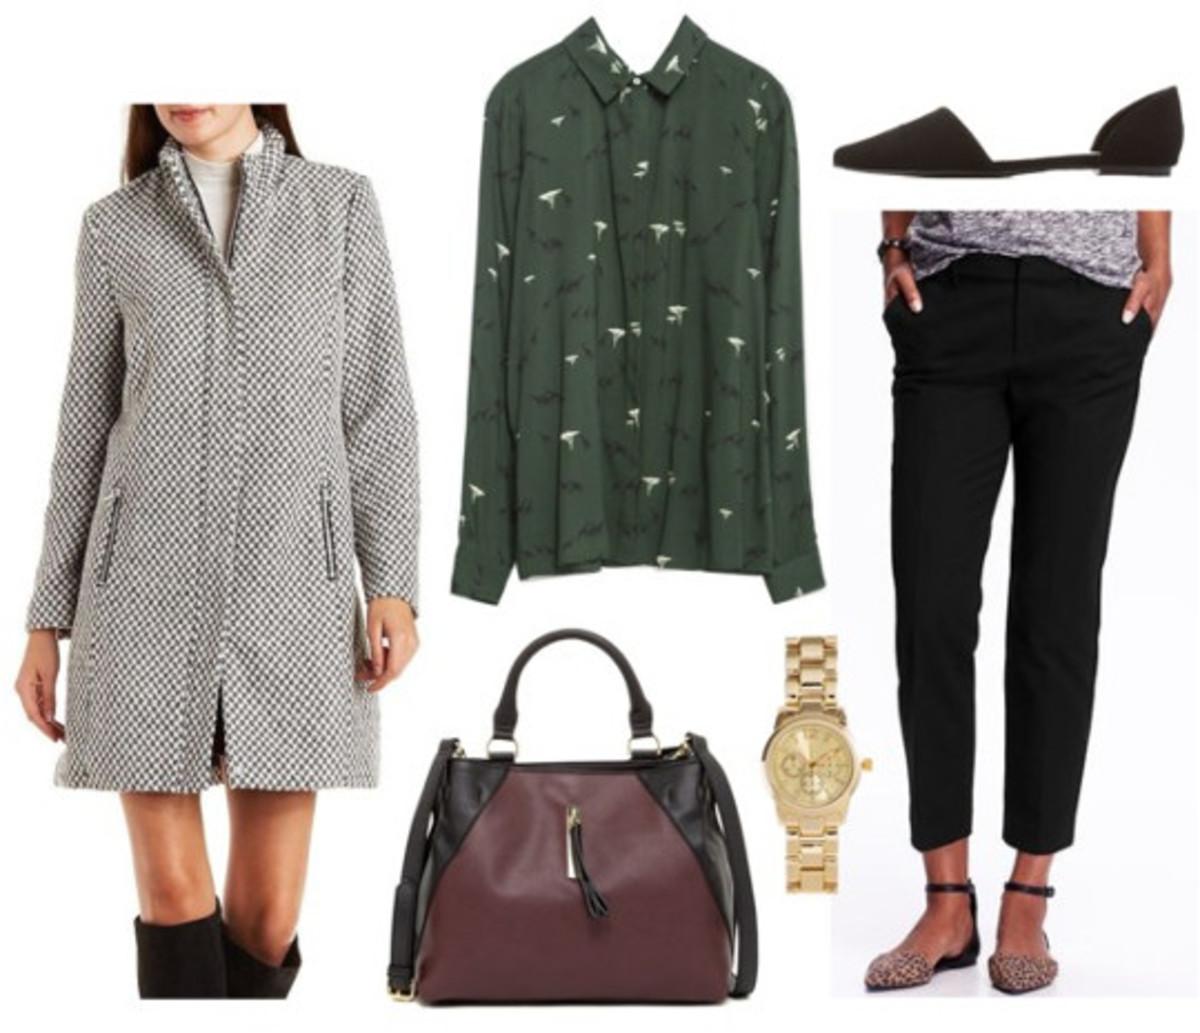 black-slim-pants-green-dark-top-blouse-print-brown-bag-watch-black-shoe-flats-grayl-jacket-coat-howtowear-fashion-style-outfit-fall-winter-work.jpg